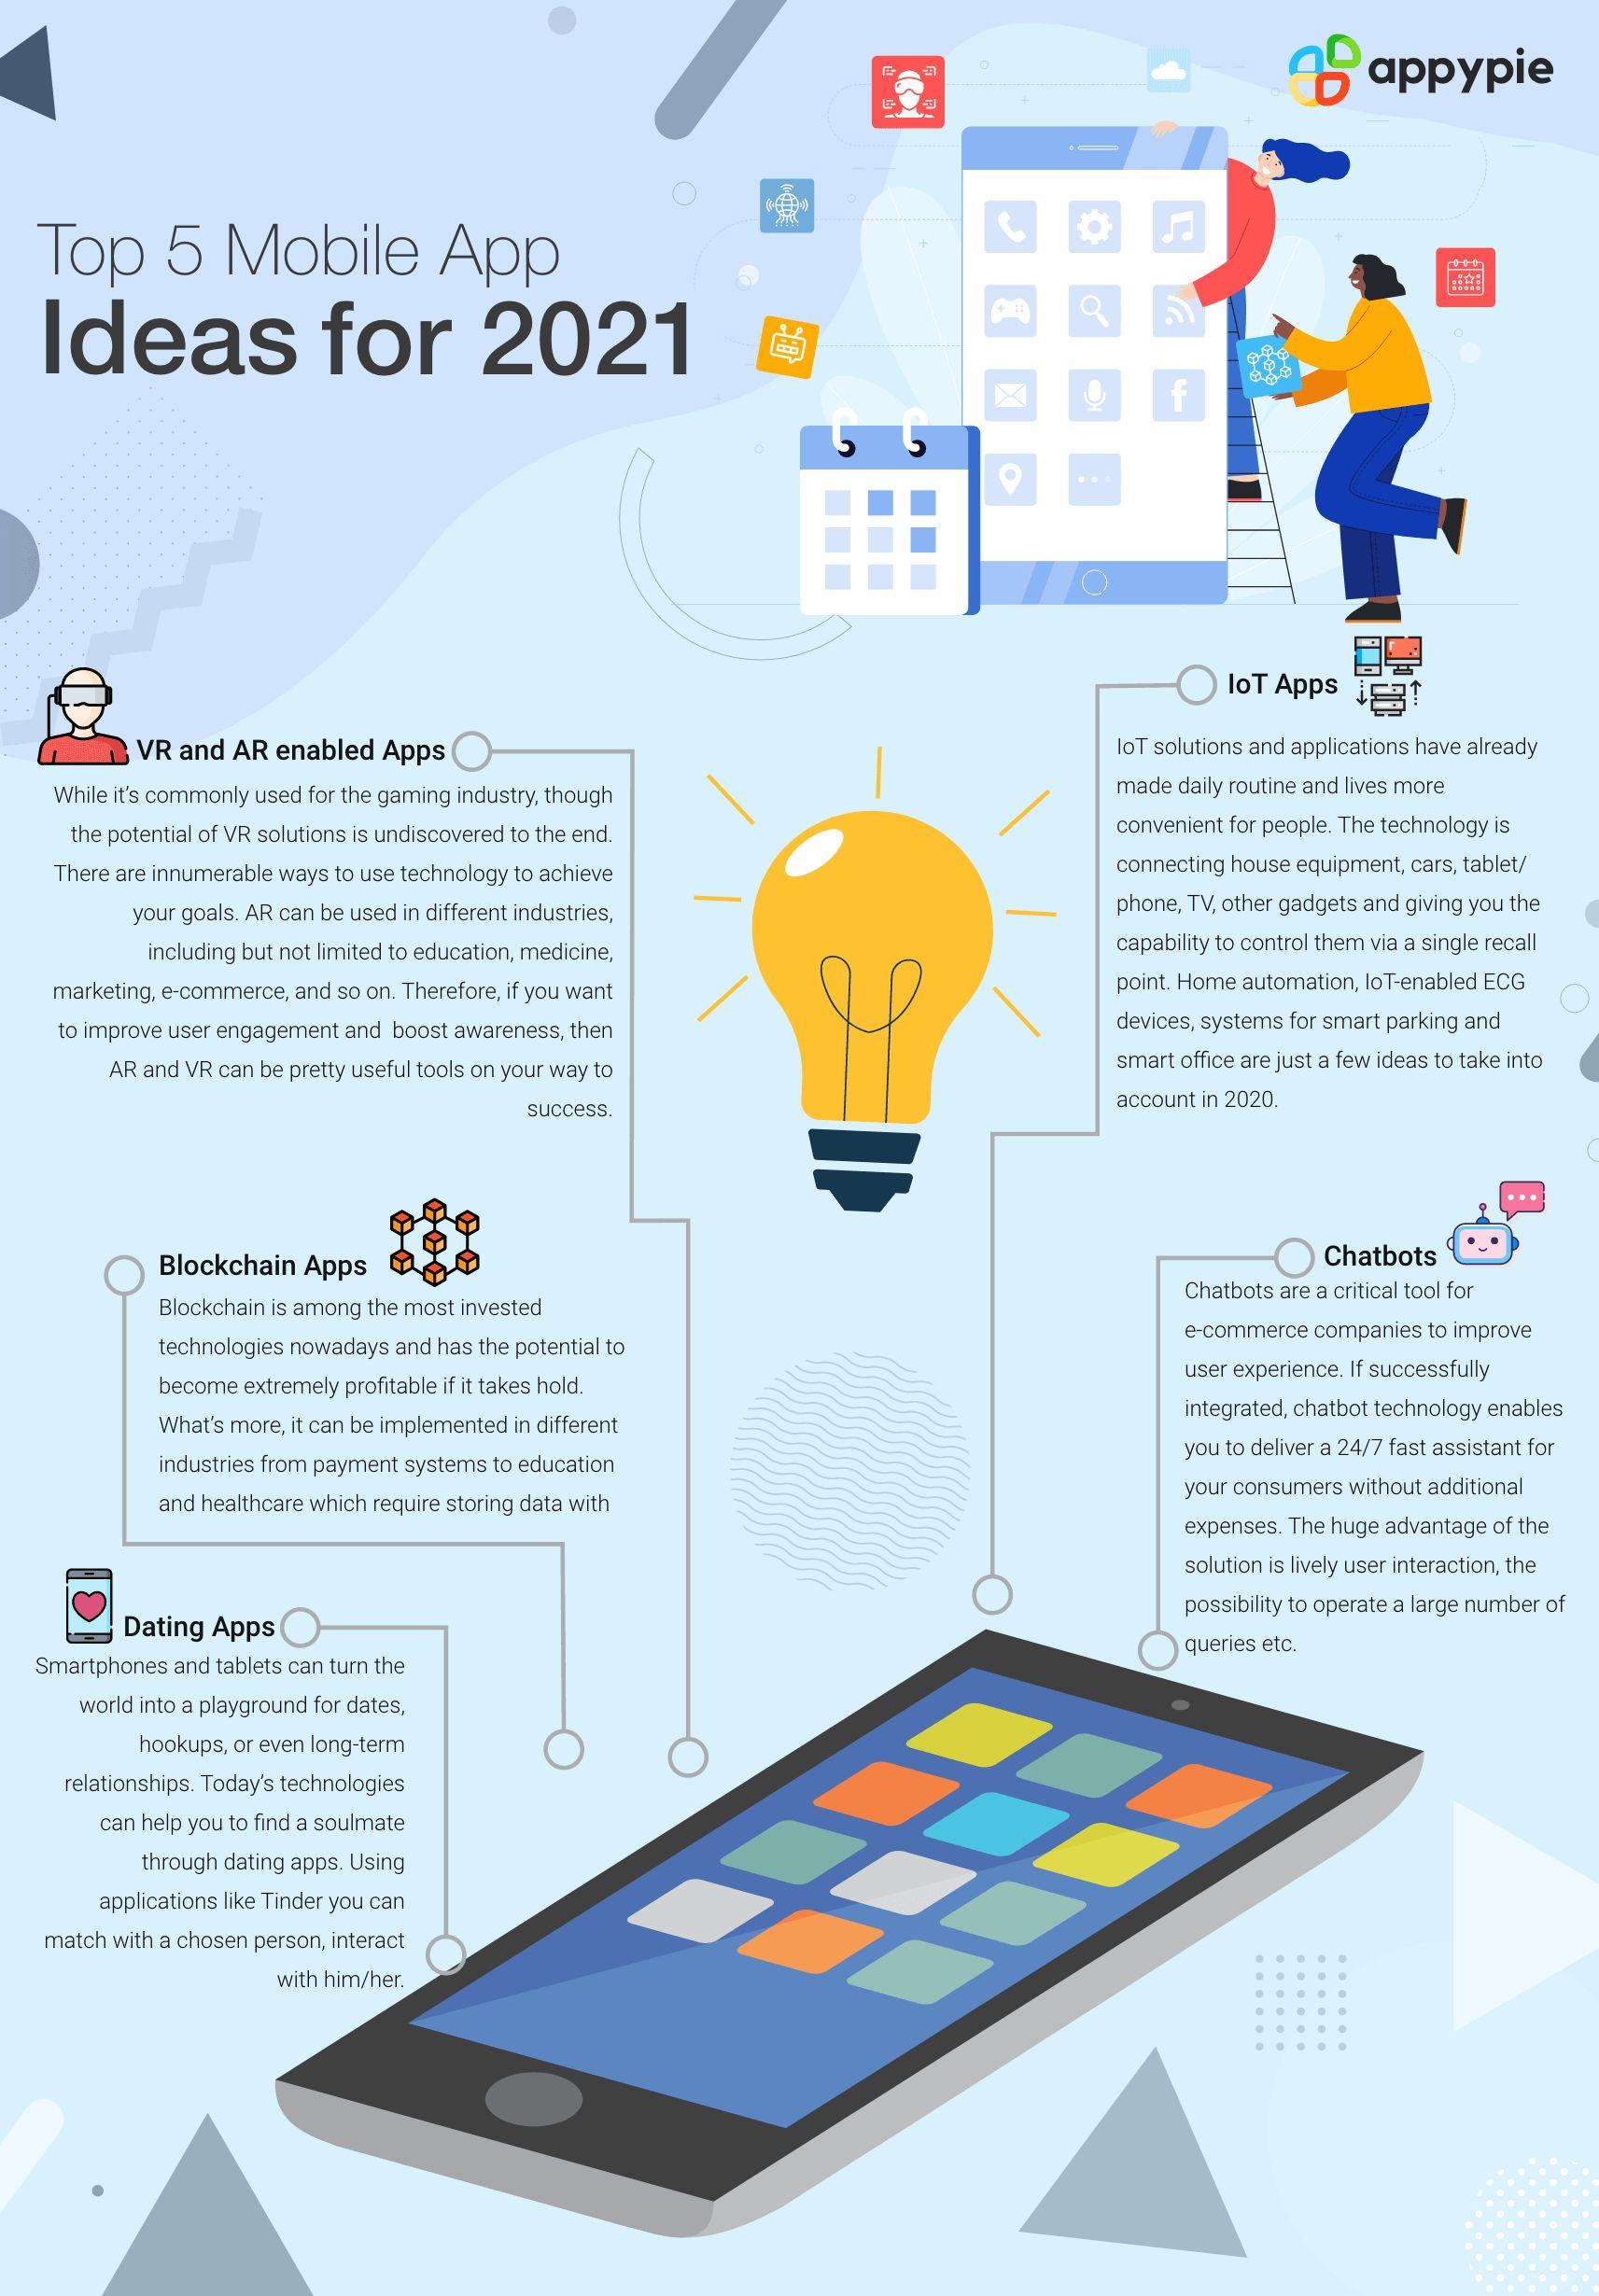 Top 5 Mobile App Ideas for 2021 - Appy Pie